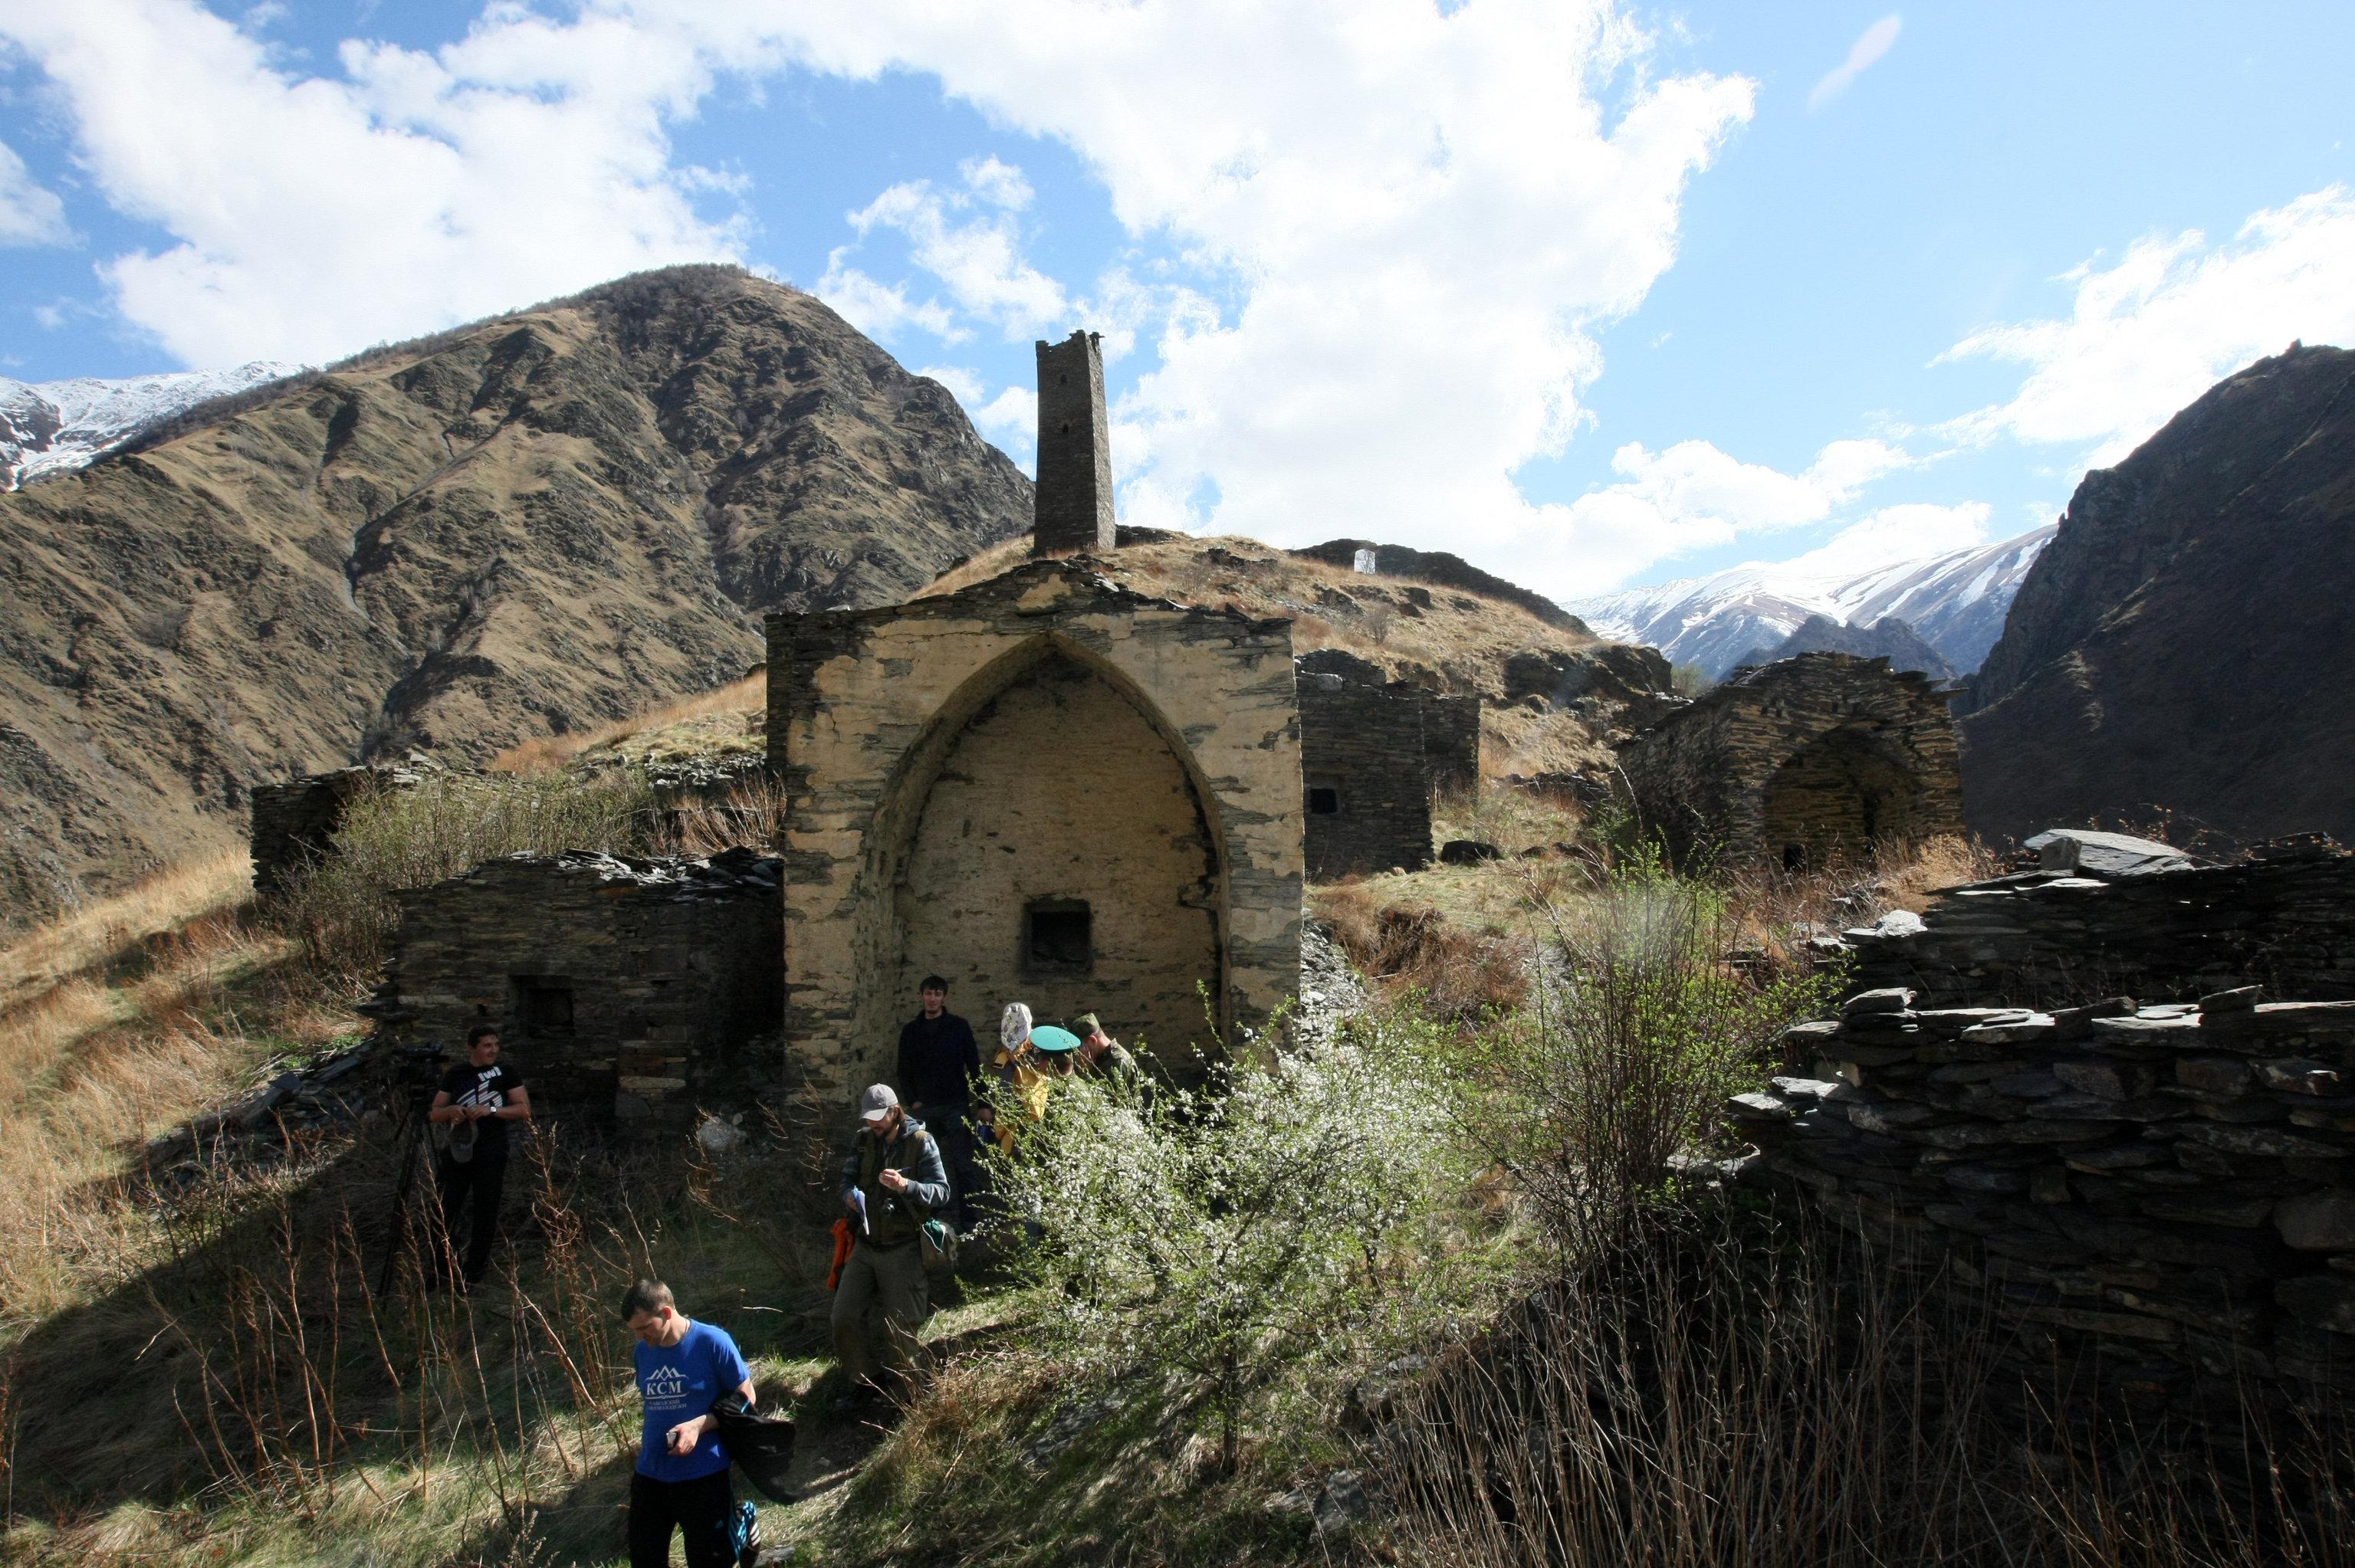 The Tsoi-Pede Necropolis in the Argunsky nature reserve, Itum-Kalinsky District, Chechen Republic, near the Georgian border